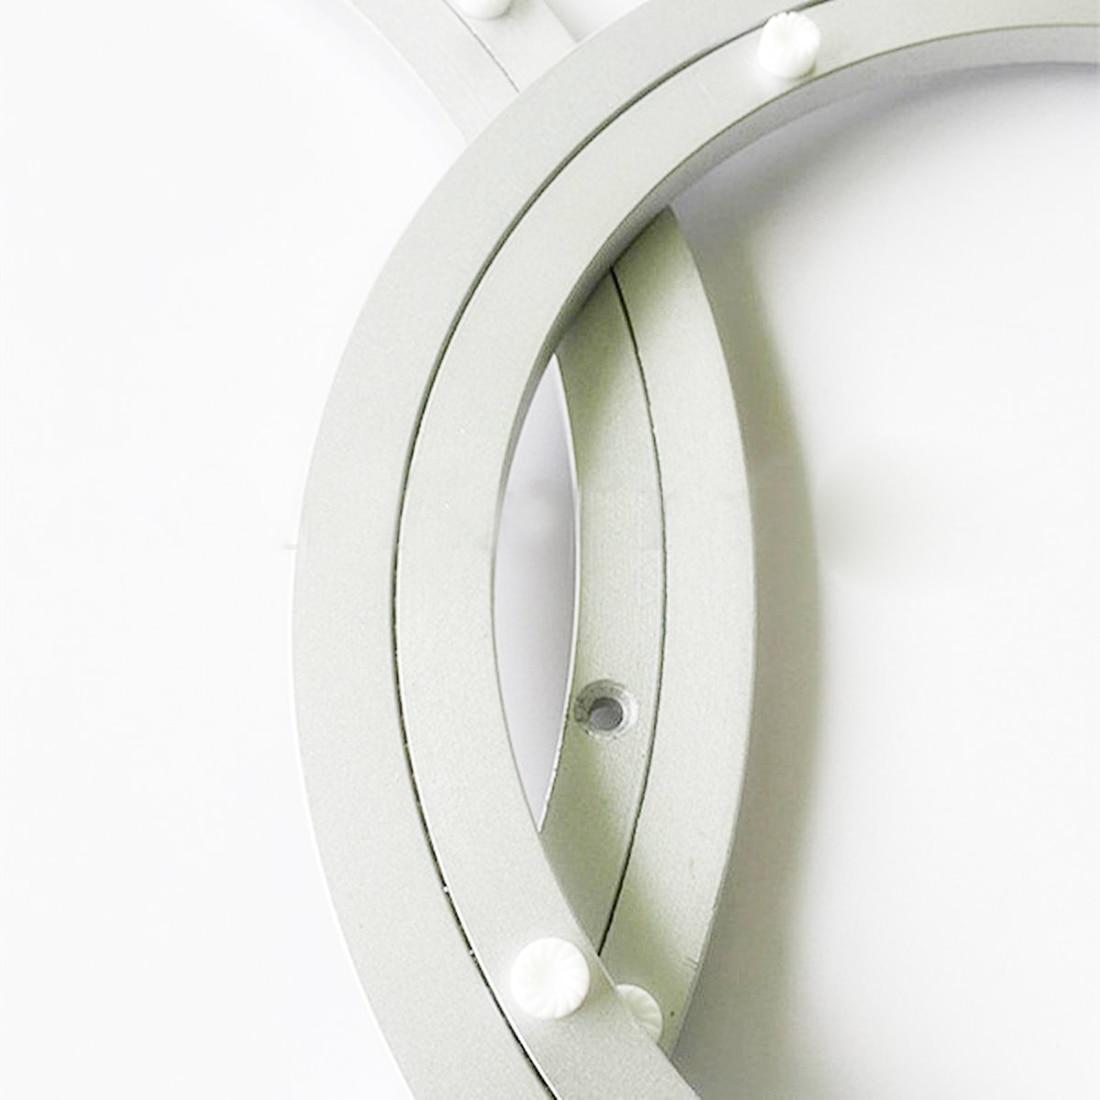 Aluminium Rotating Turntable Bearing Swivel Plate 18 Inch Silver crb30025uut1 crbc30025uut1 crossed roller bearings 300x360x25mm turntable bearing tlanmp slewing turntable use